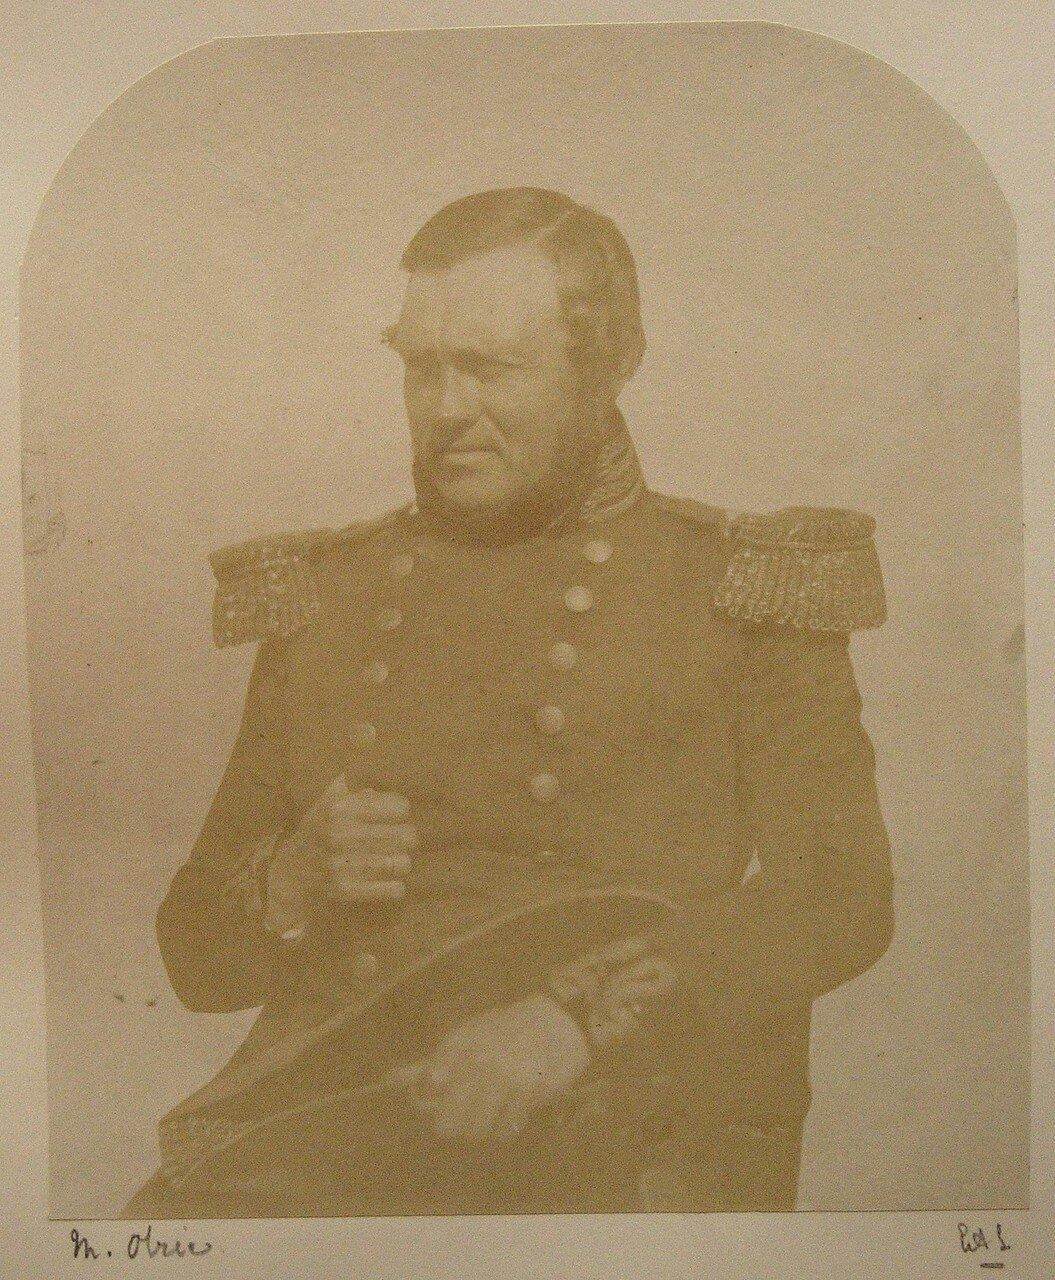 �������� ����� ������ ����� (1815-1870), ��������� �������� ����������